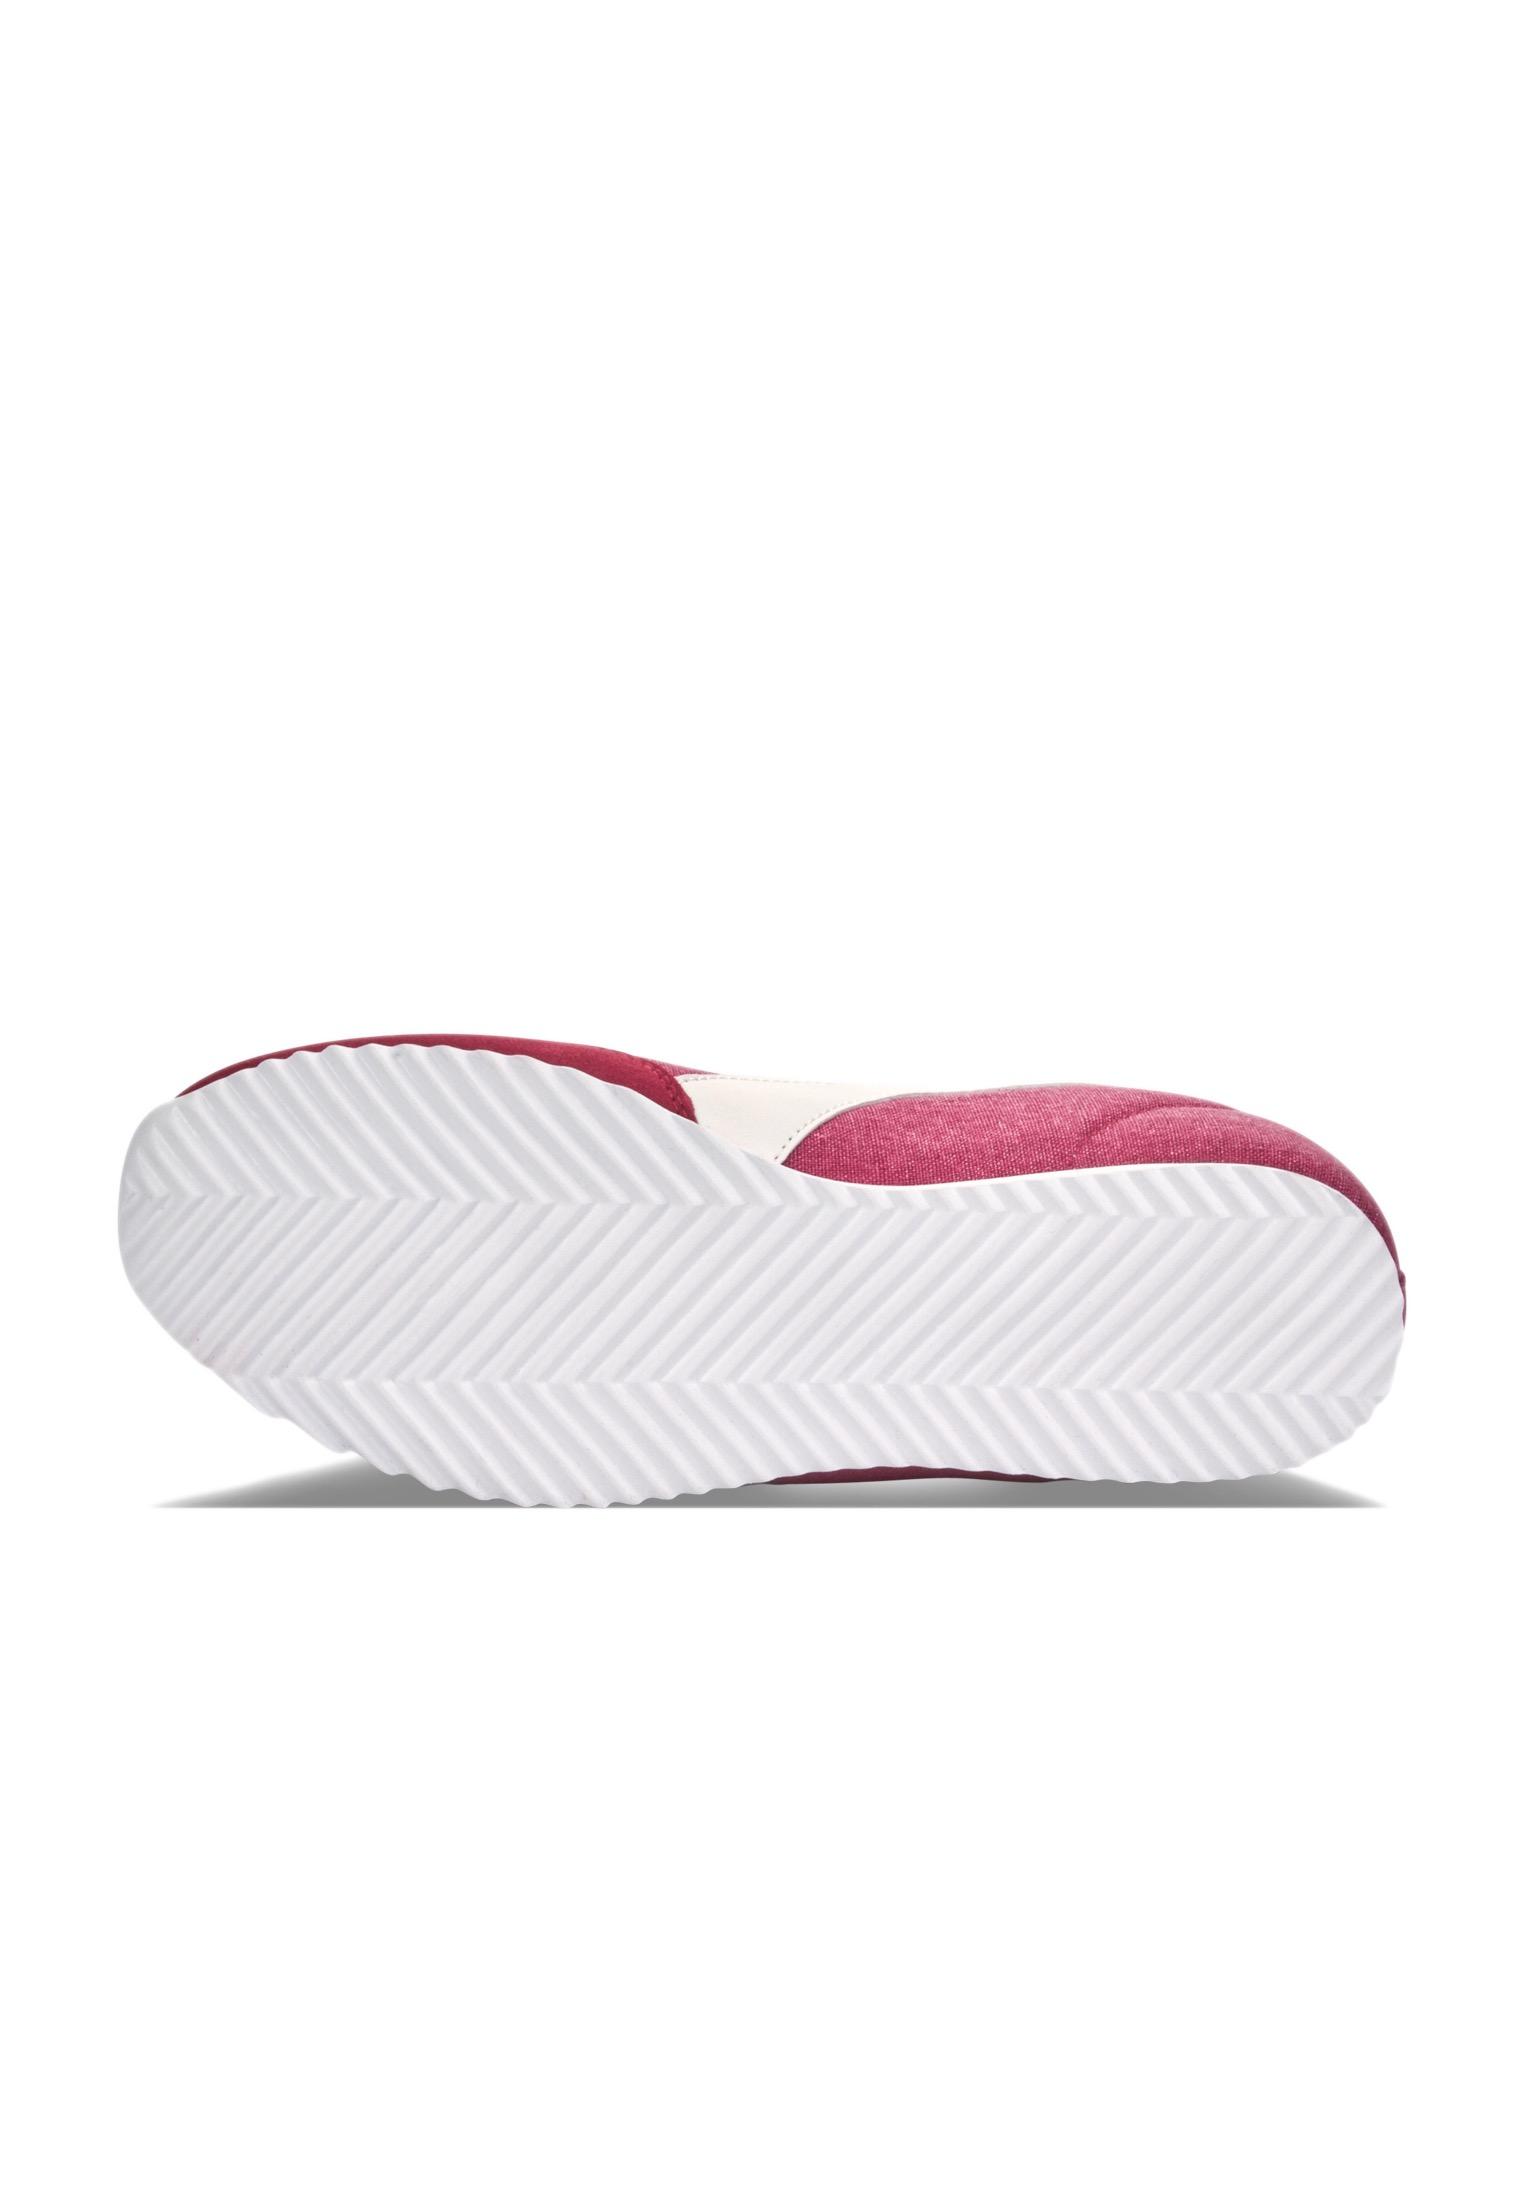 Scarpe-Diadora-Jog-Light-C-Sneakers-sportive-uomo-donna-vari-colori-e-taglie miniatura 3